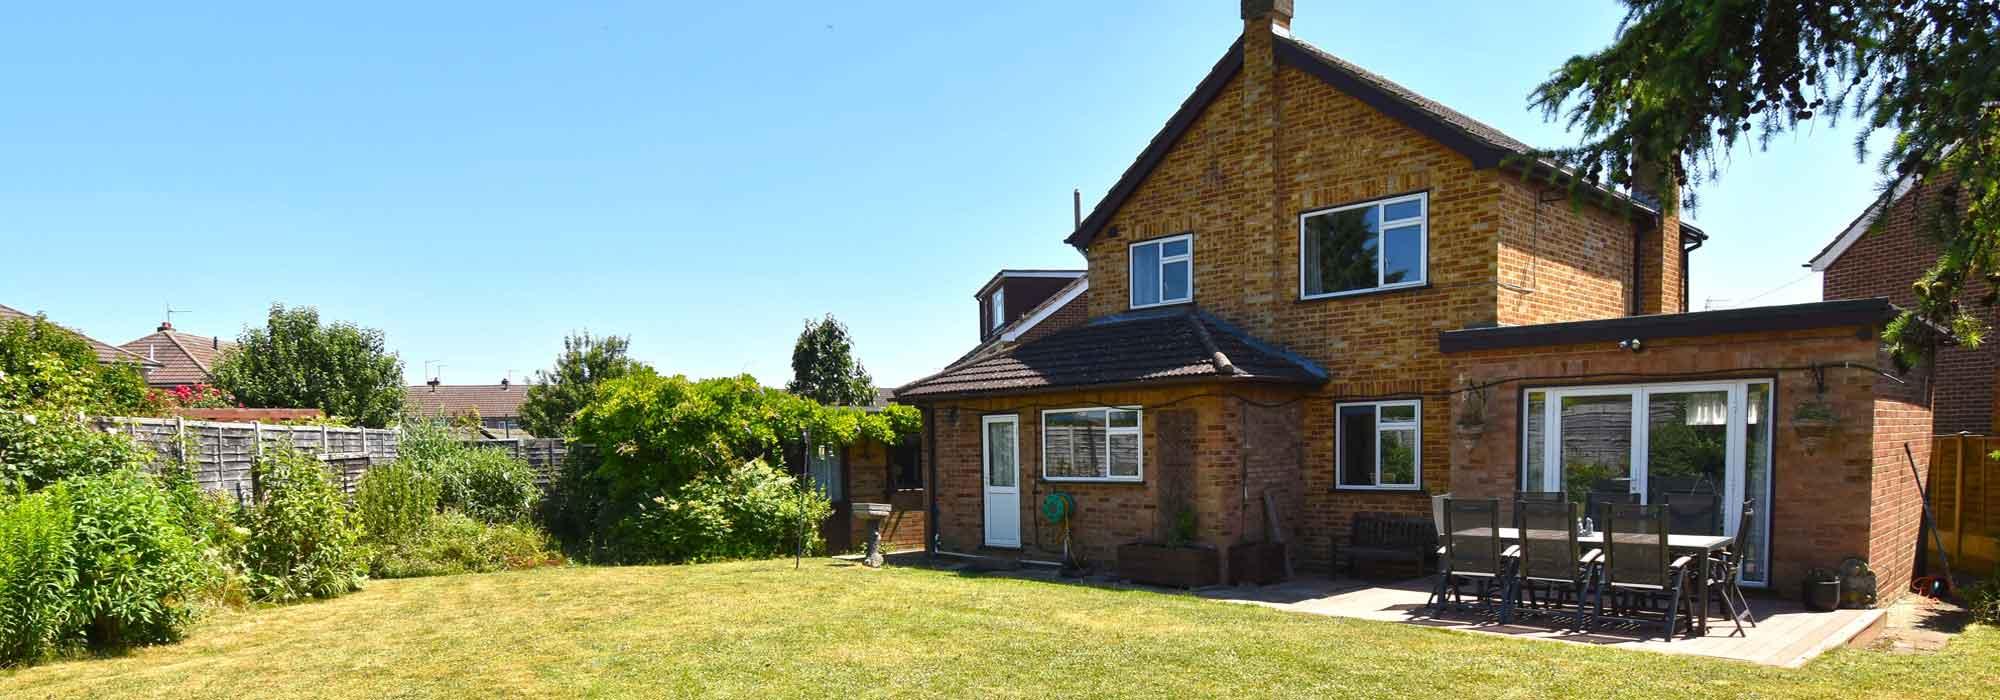 Barnfield Close, Hoddesdon, Hertfordshire, EN11 9EP.